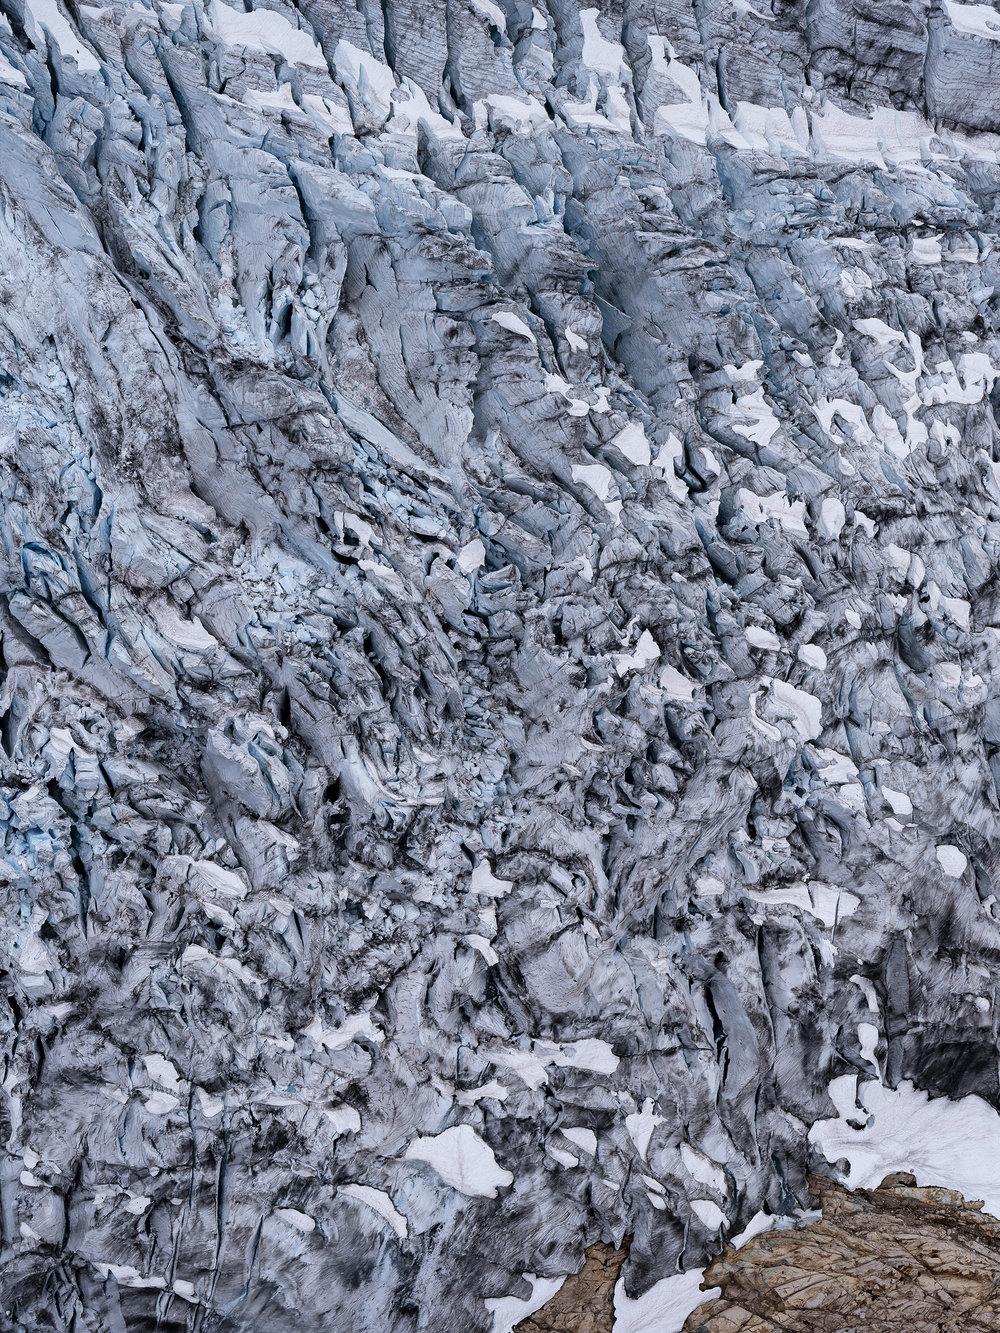 Icefield Study #15 | Waterfall (2018)